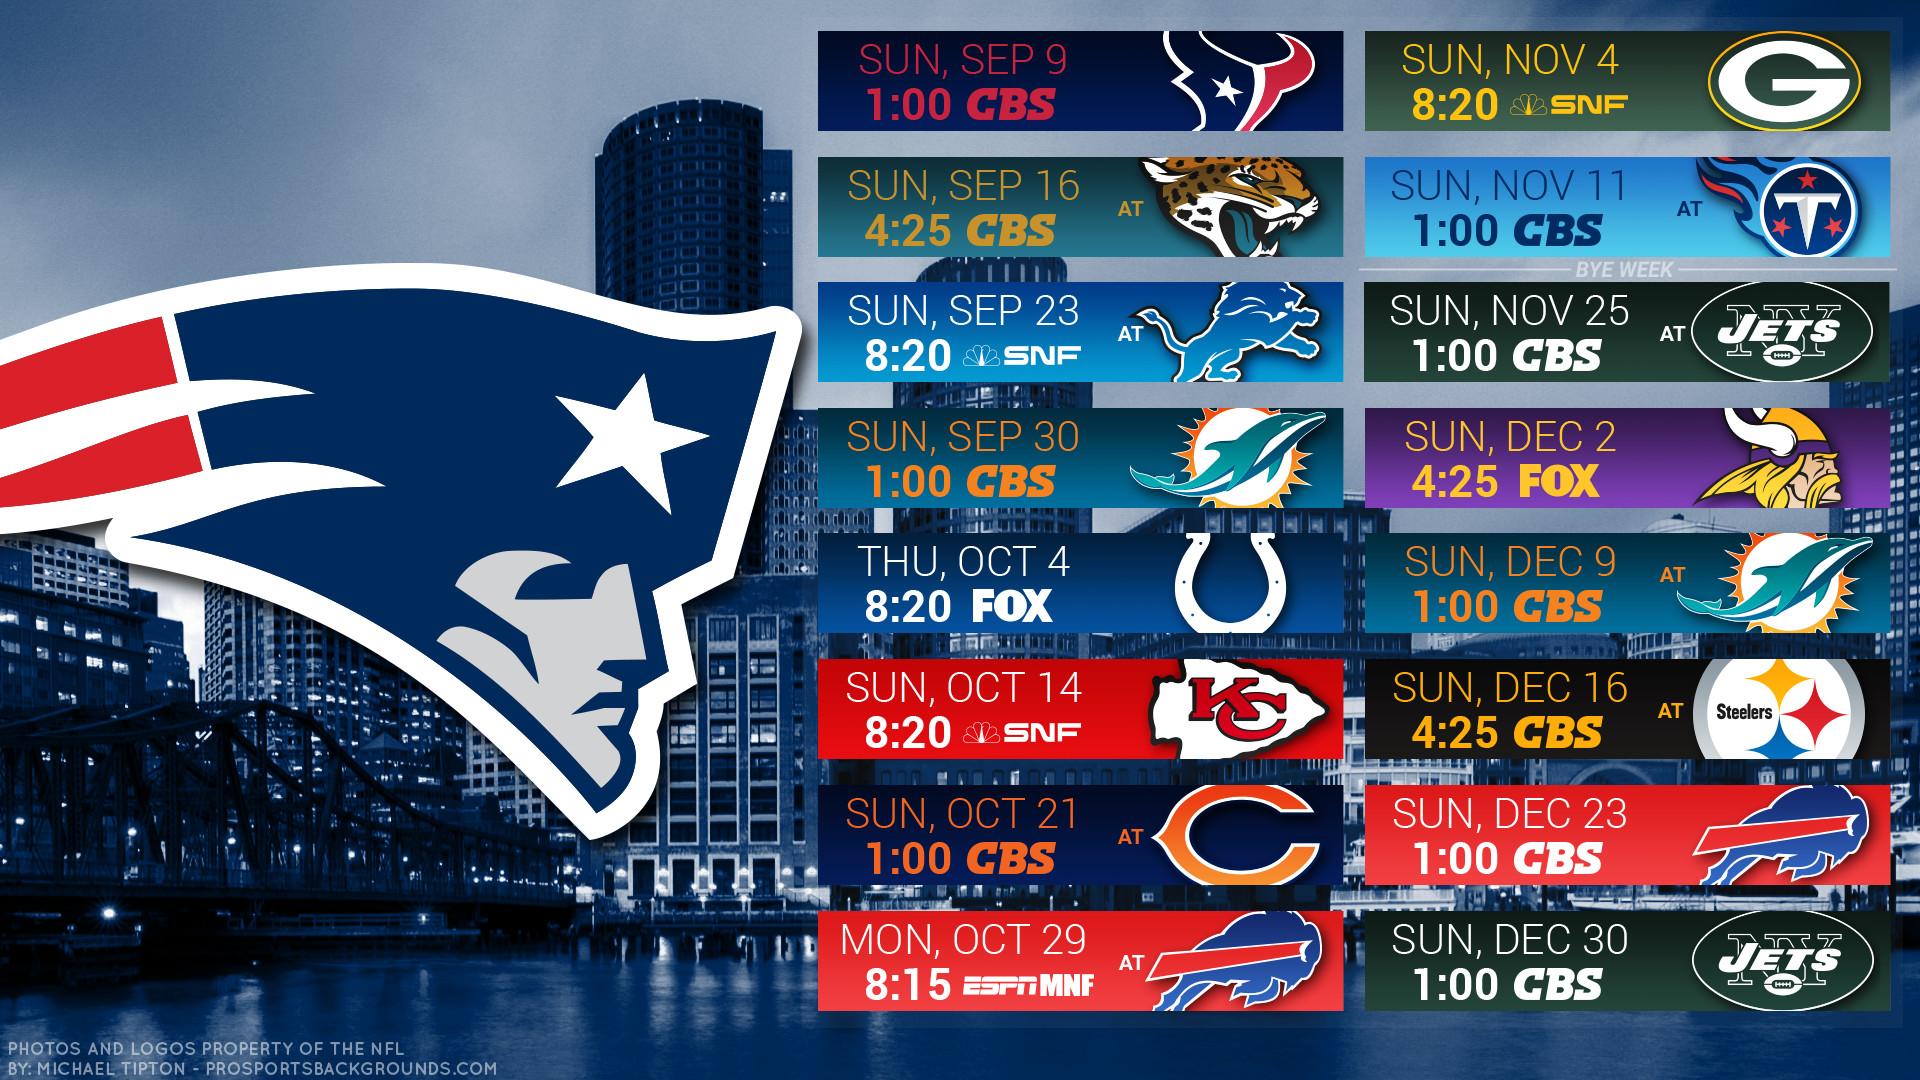 New England Patriots 2018 Schedule City Logo Wallpaper - New England Patriots Schedule 2018 - HD Wallpaper